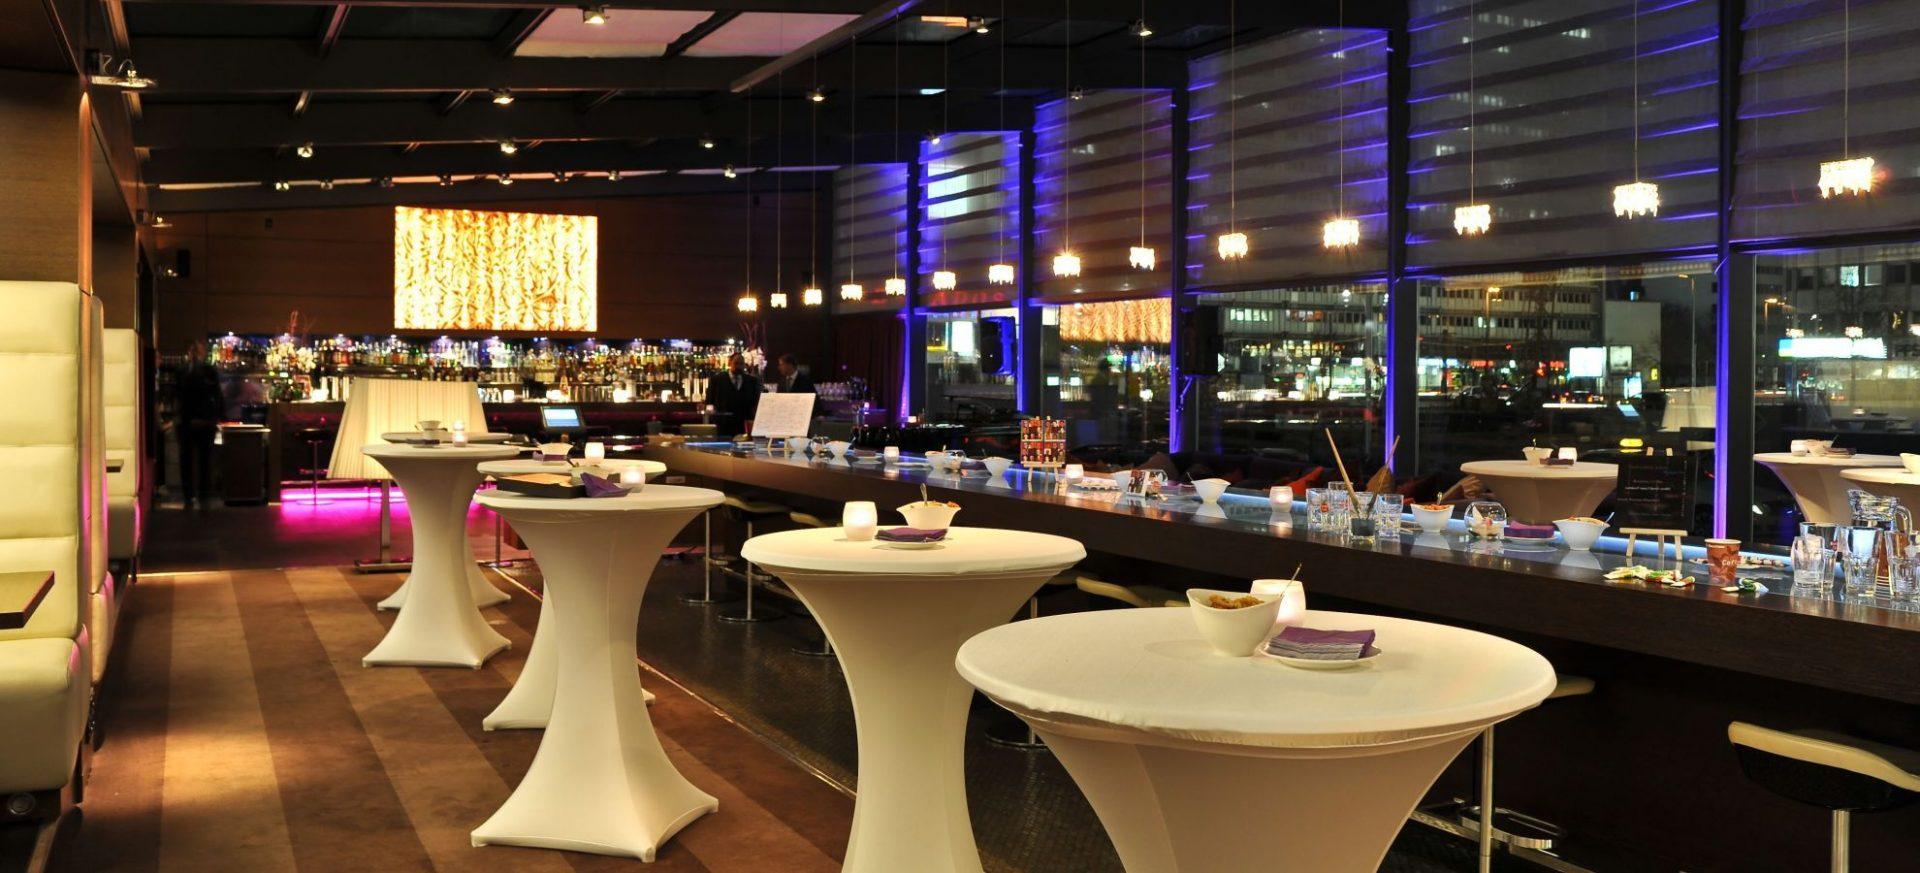 Park Inn Berlin Alexanderplatz Spagos Restaurant, Bar & Lounge